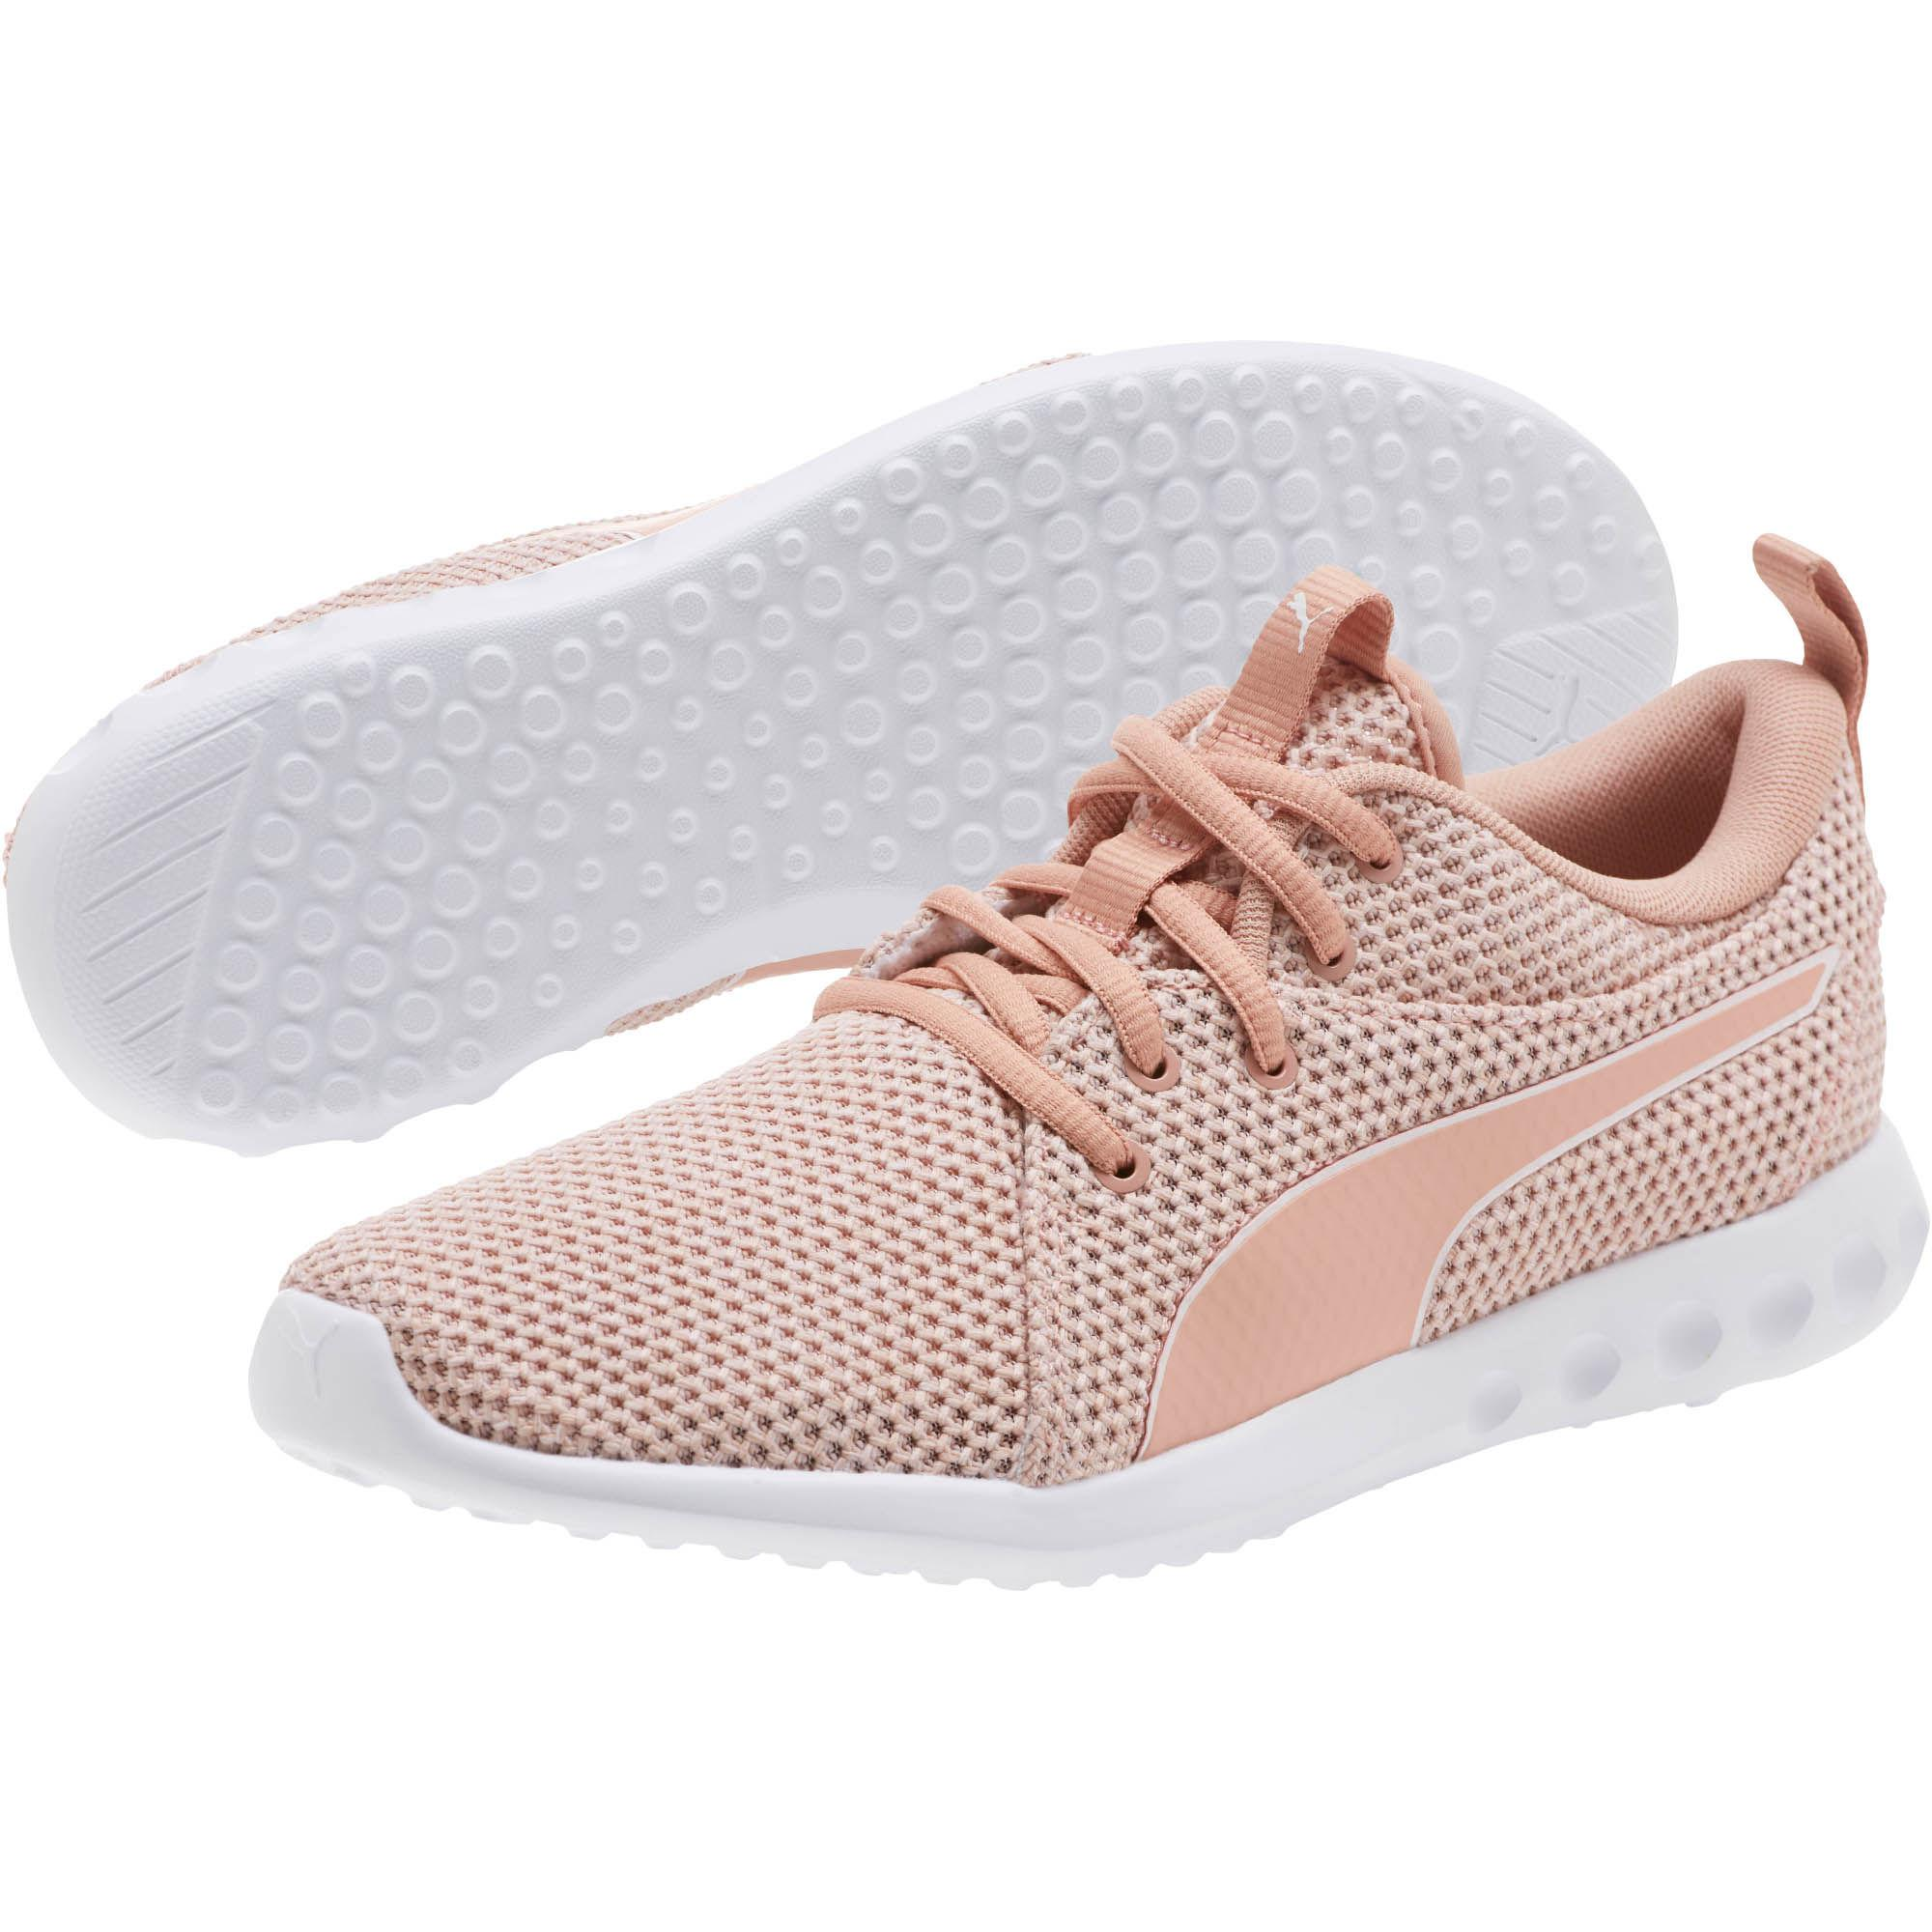 6194645158aa50 ... Carson 2 Nature Knit Women s Running Shoes - Lyst. View fullscreen